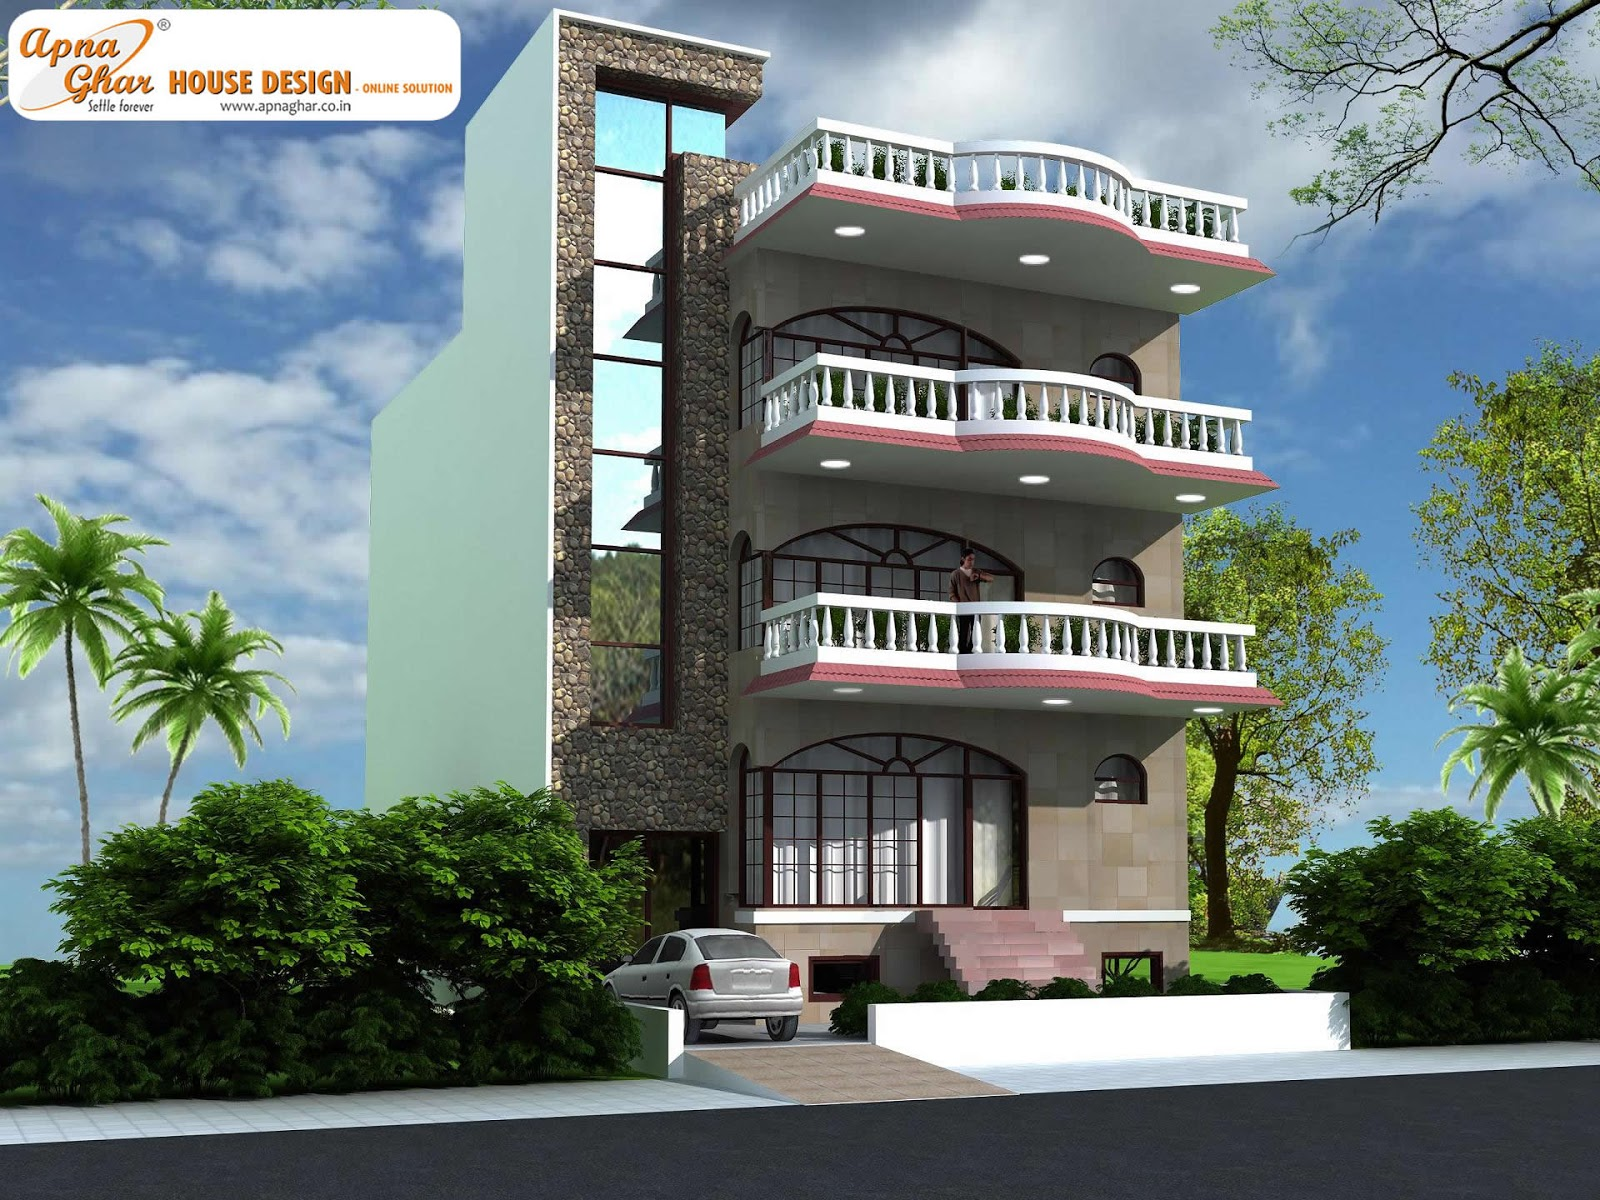 Triplex house design apnaghar page 2 - Triplex house plans cost cutting living ...